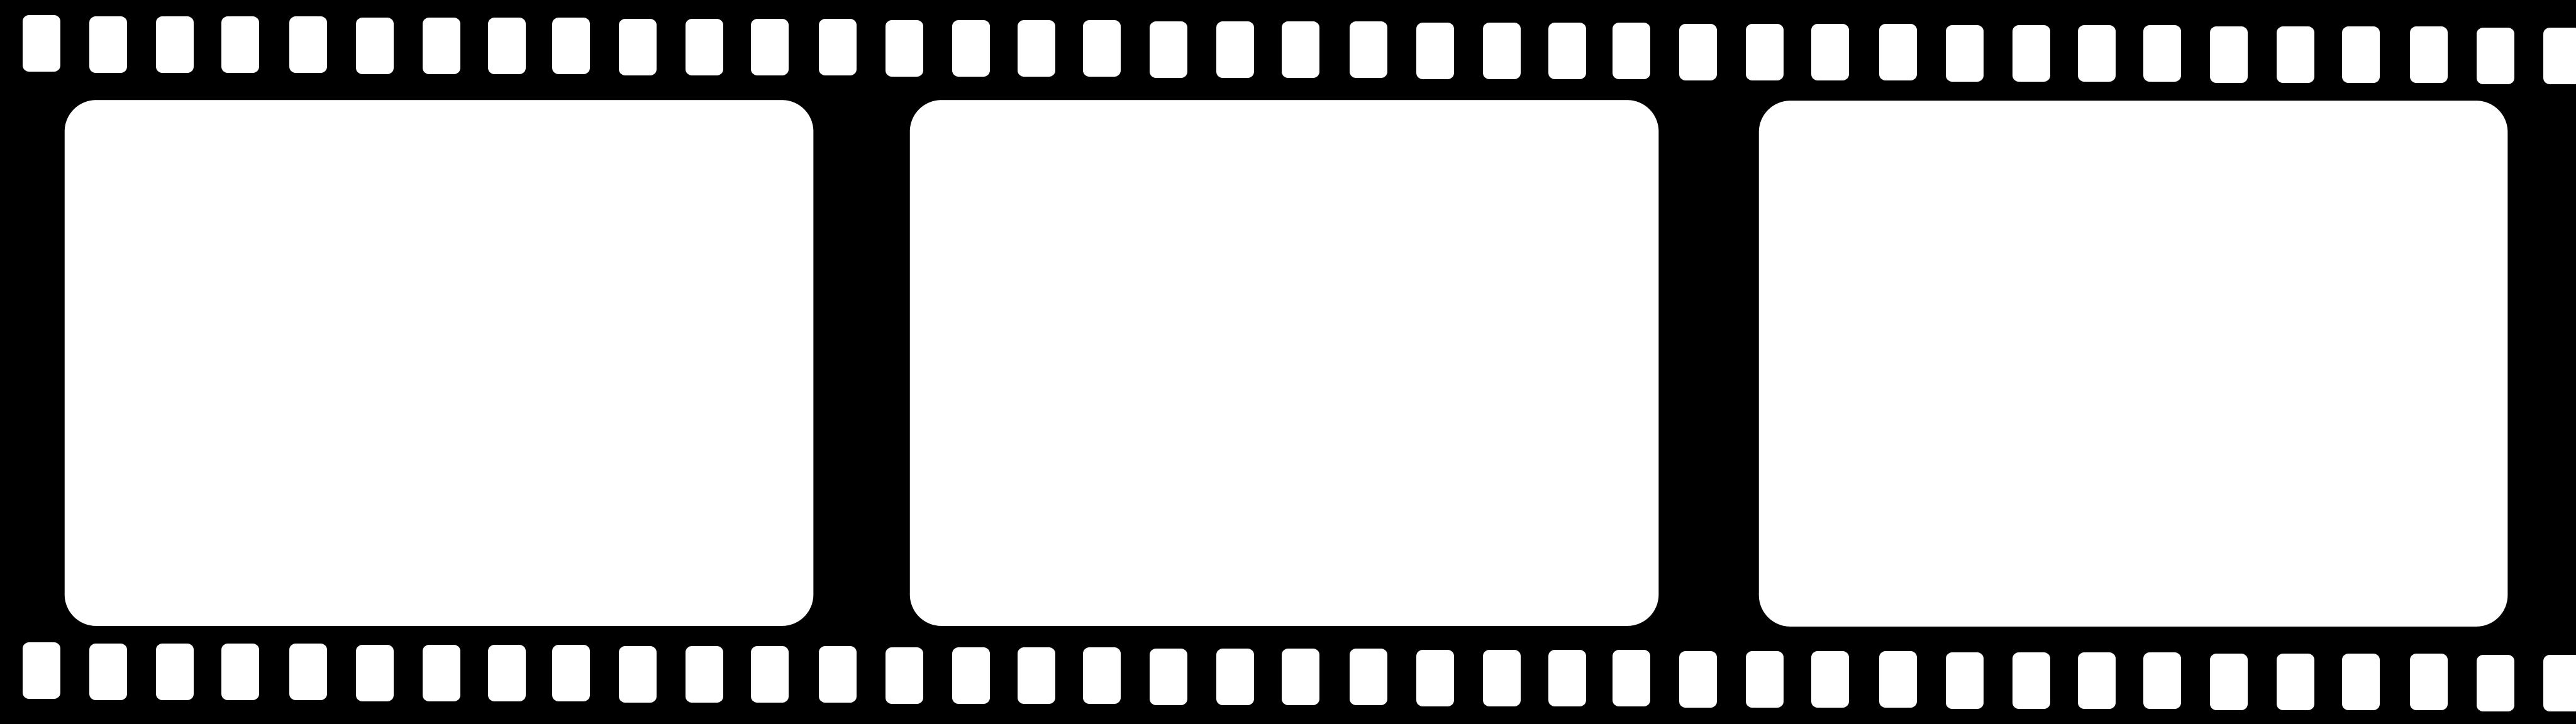 Free border cliparts download. Film clipart pdf